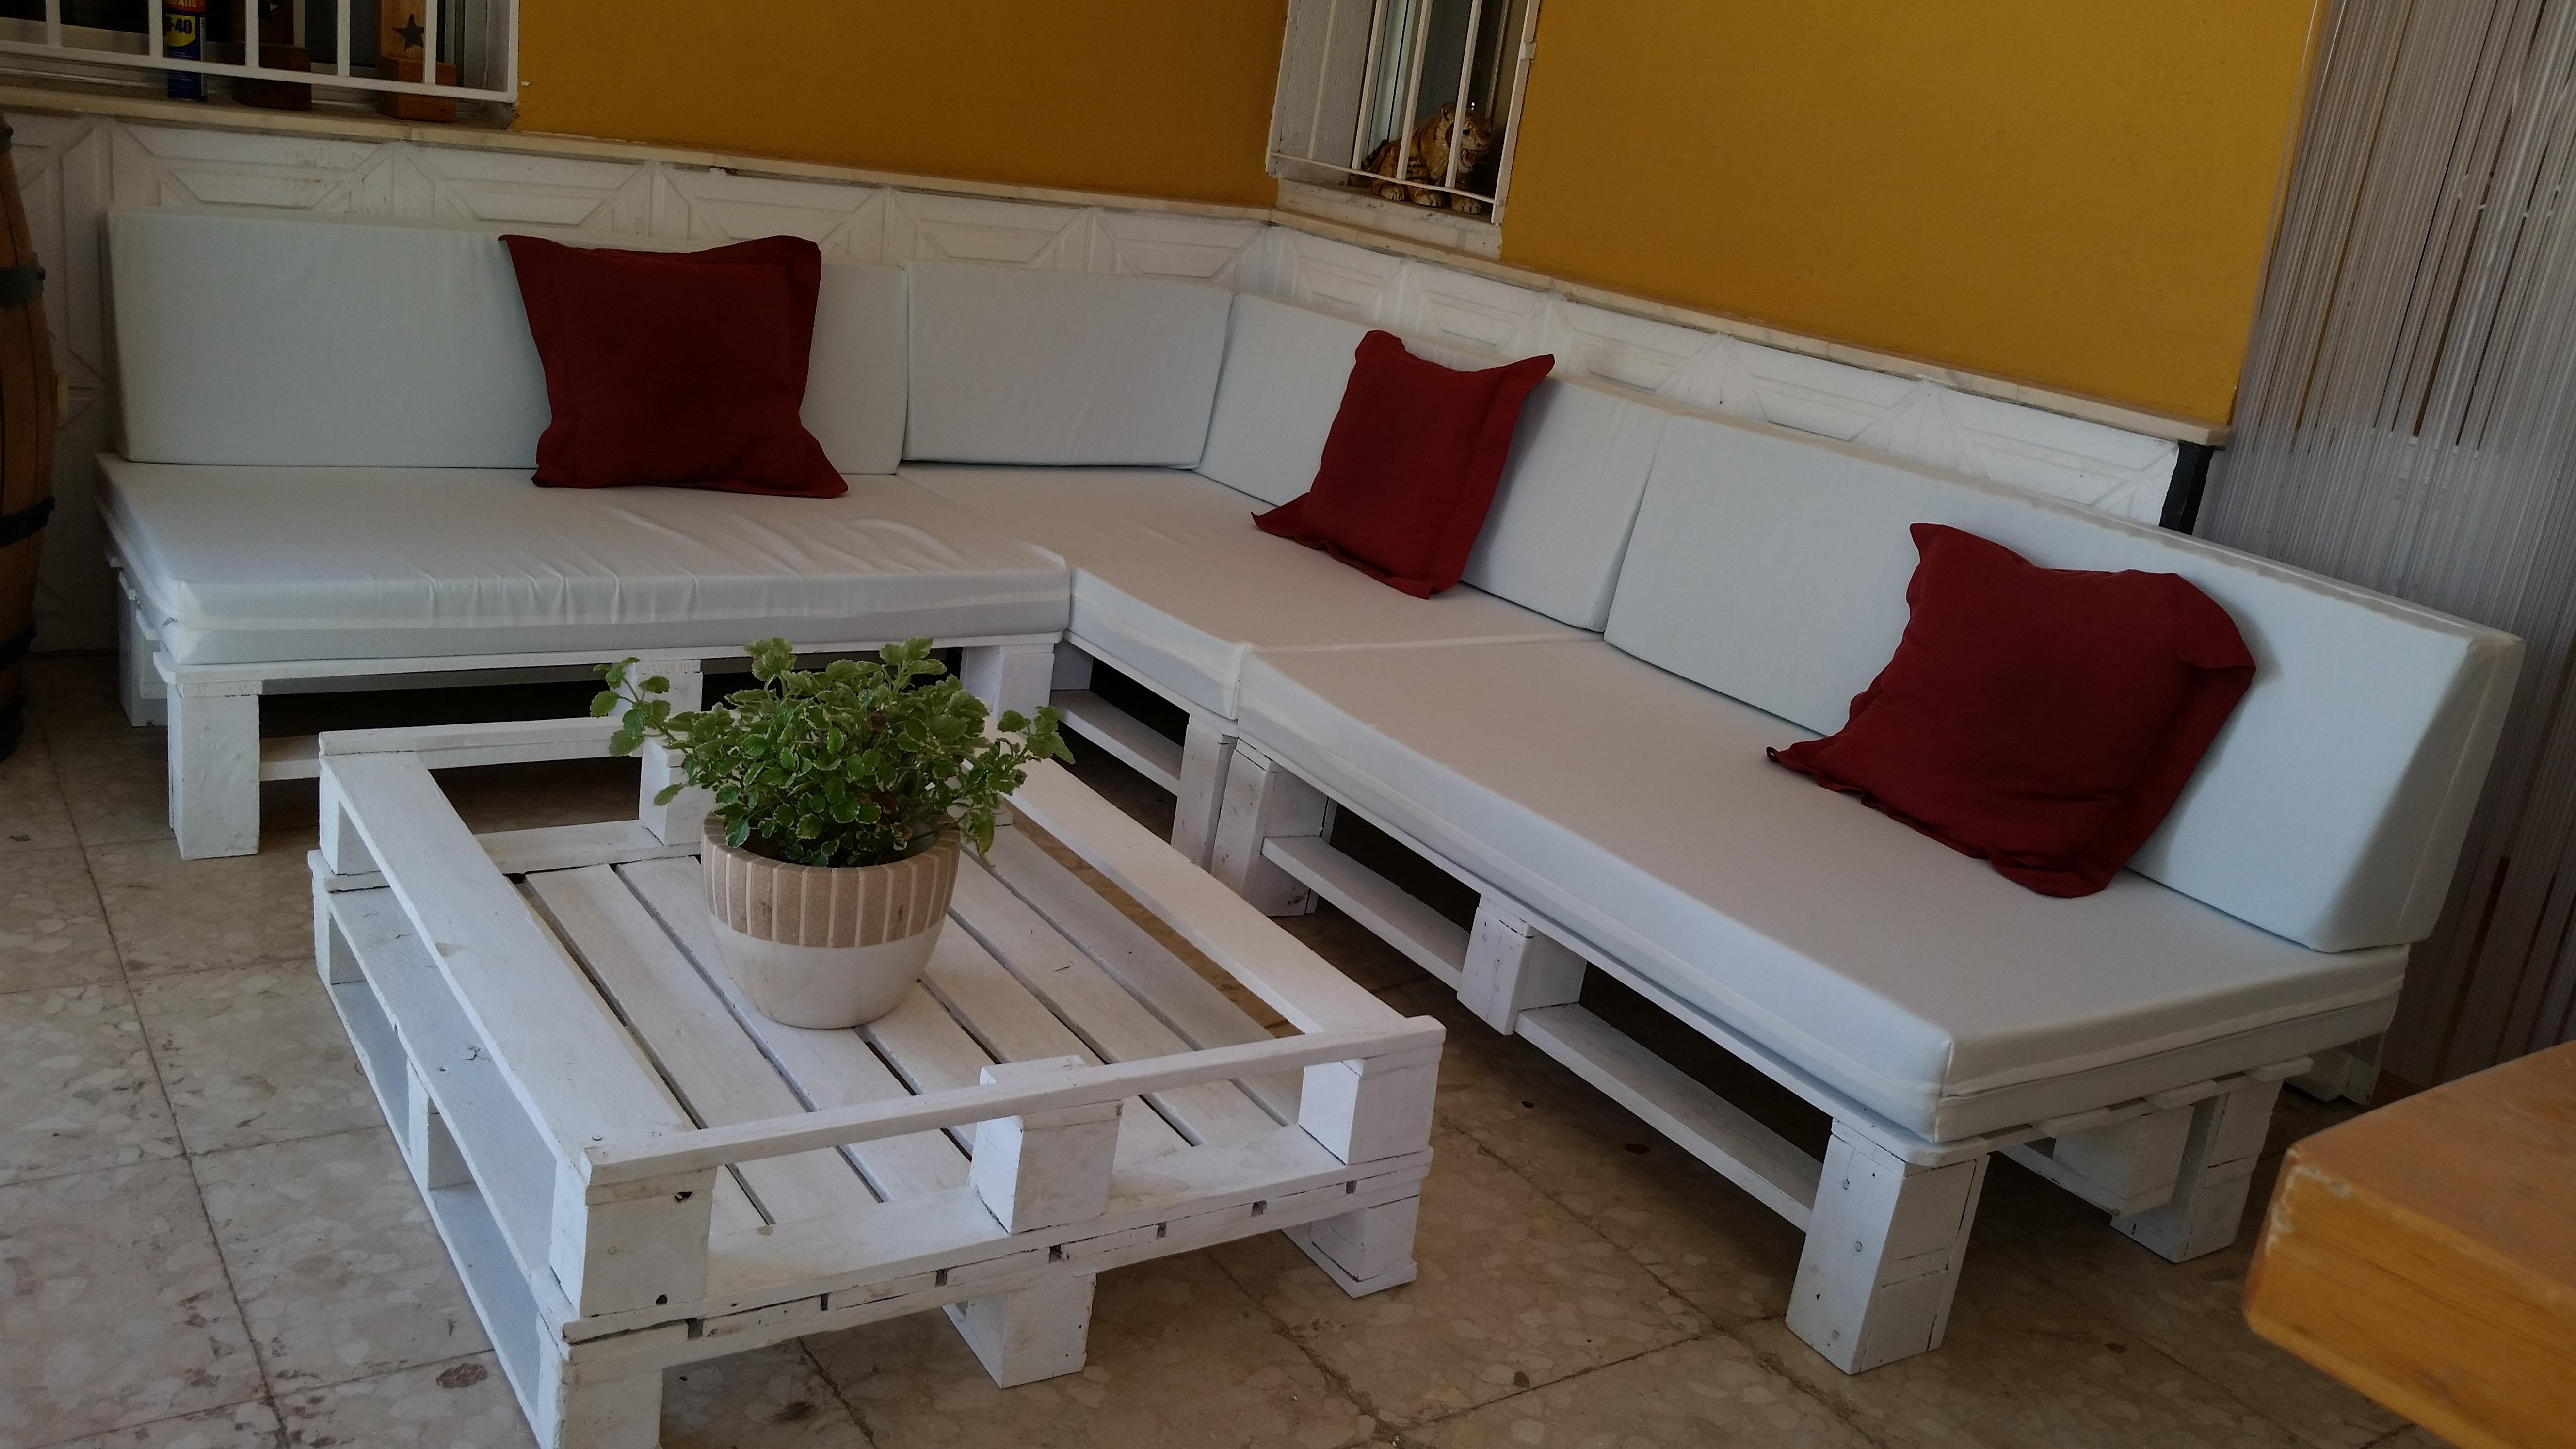 Mesas hechas con palets fabulous mesa palets chimenea - Sillones para terraza ...